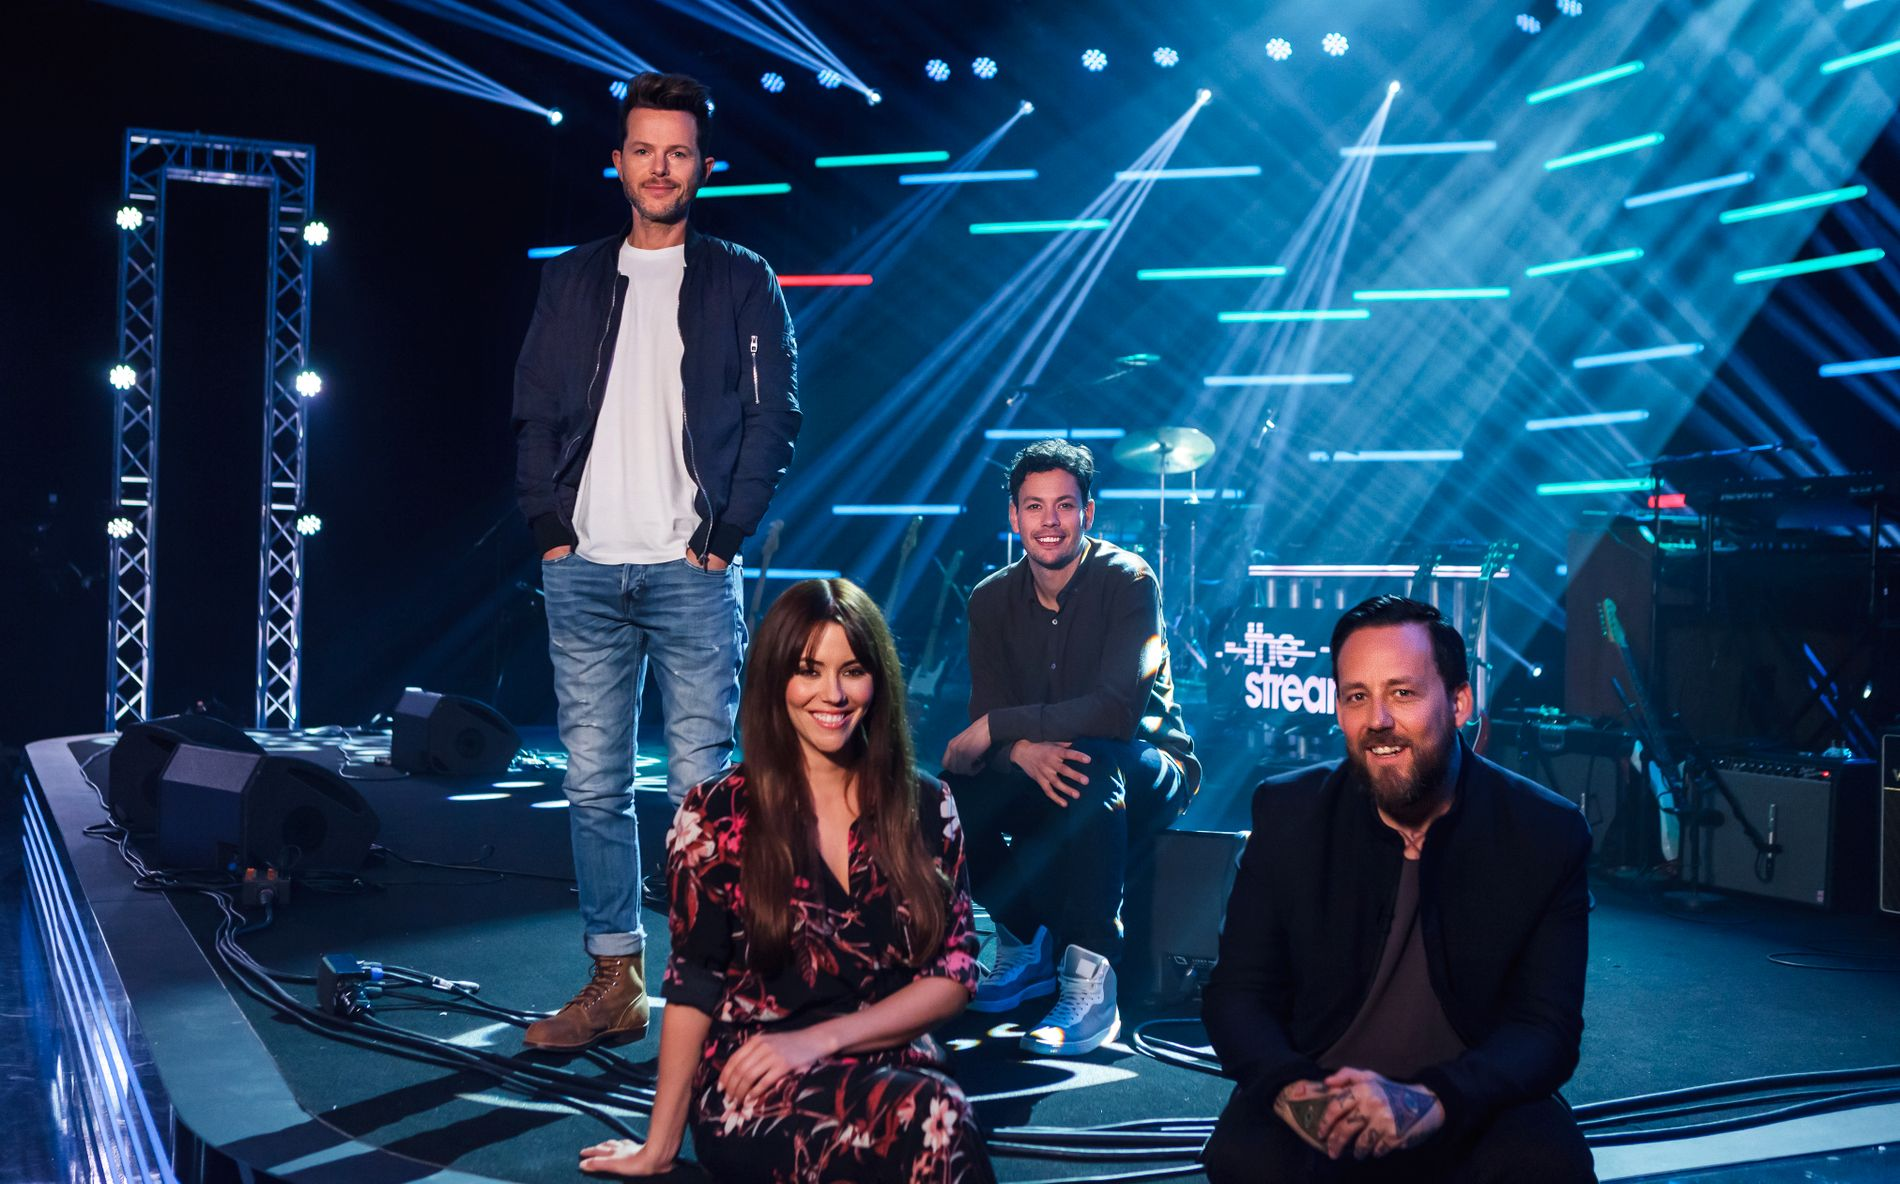 DE GODE, DE ONDE OG DE GRUSOMME: Espen Lind, Marion Ravn og Cato Sundberg er dommere i «The Stream». Porgramleder Tarjei Strøm til høyre. Foto: ROBERT HOLAND / TV2.